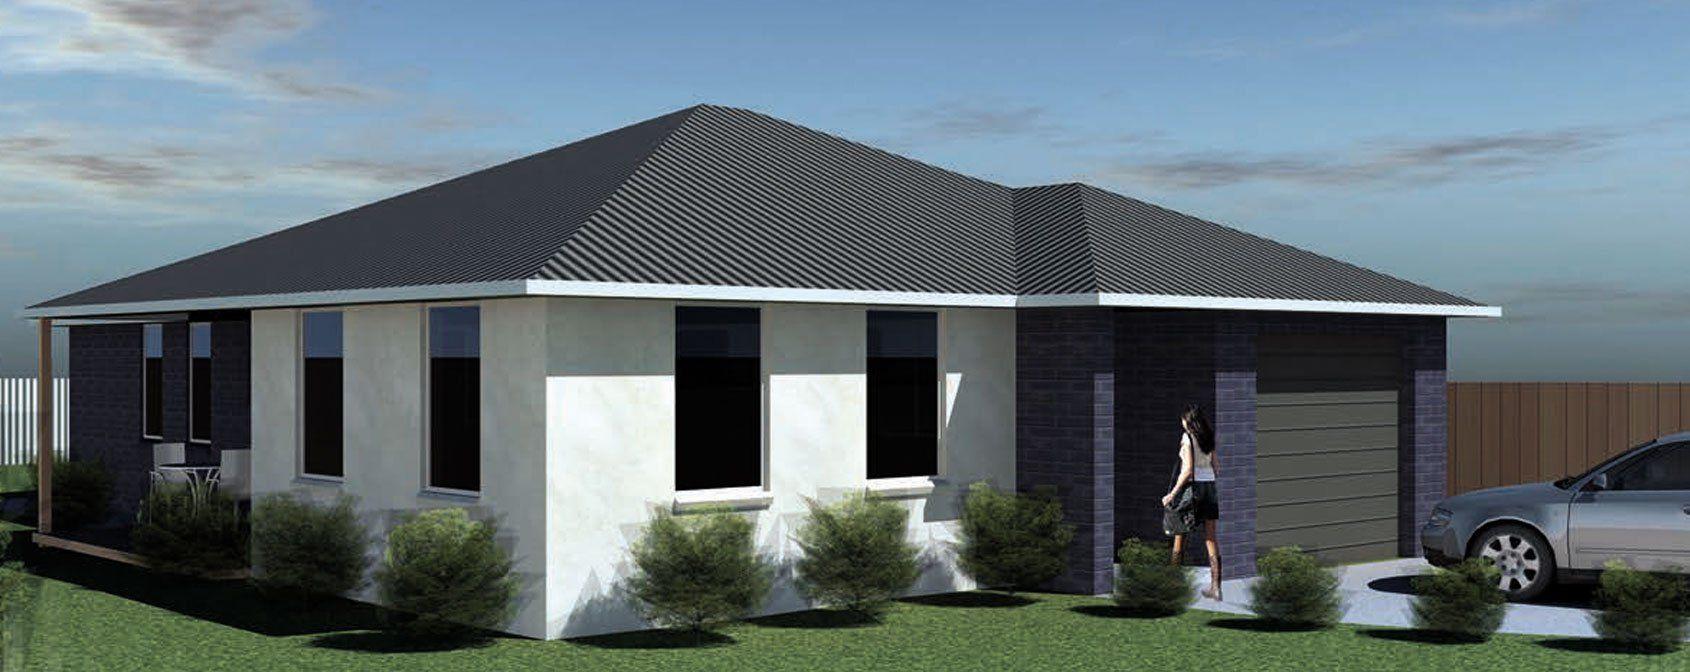 Whitelea bedroom new home design by wilson homes also floor plans in rh pinterest